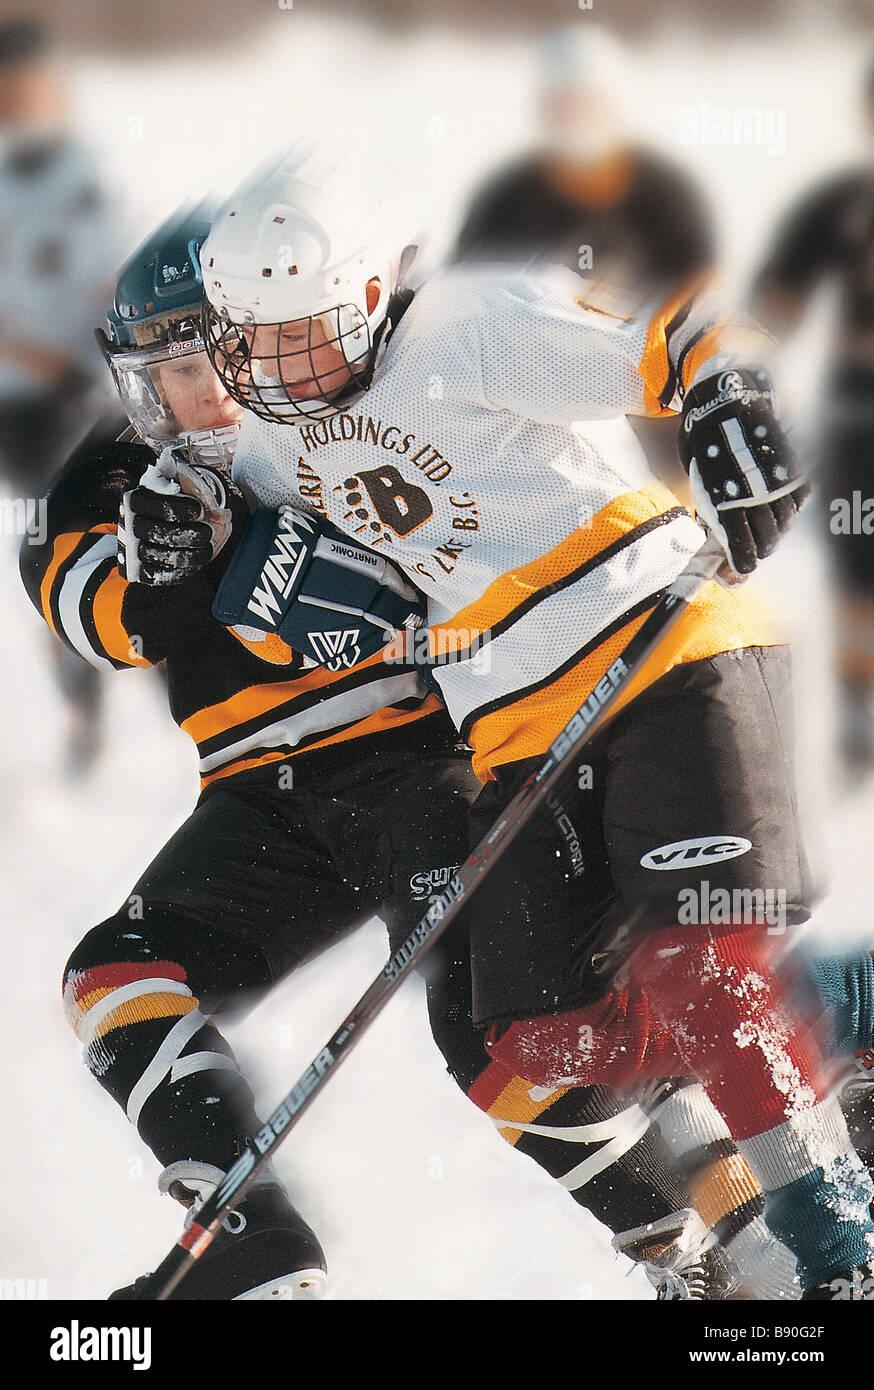 FL2825, DARWIN WIGGETT; Hockey game - Stock Image